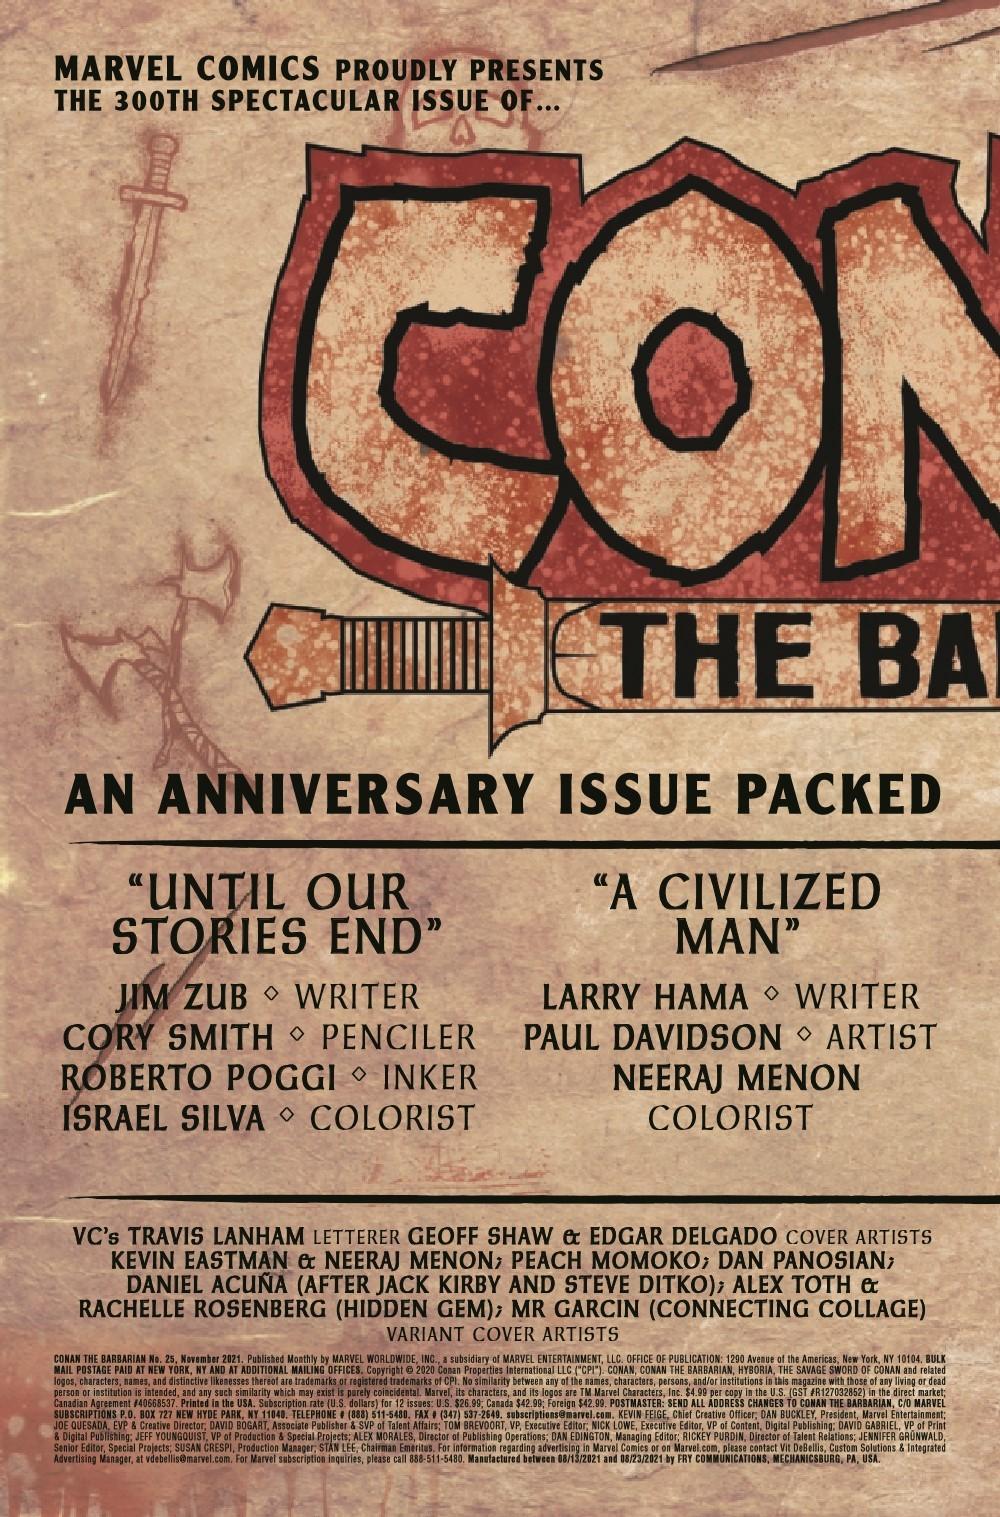 CONANBARB2019025_Preview-2 ComicList Previews: CONAN THE BARBARIAN #25